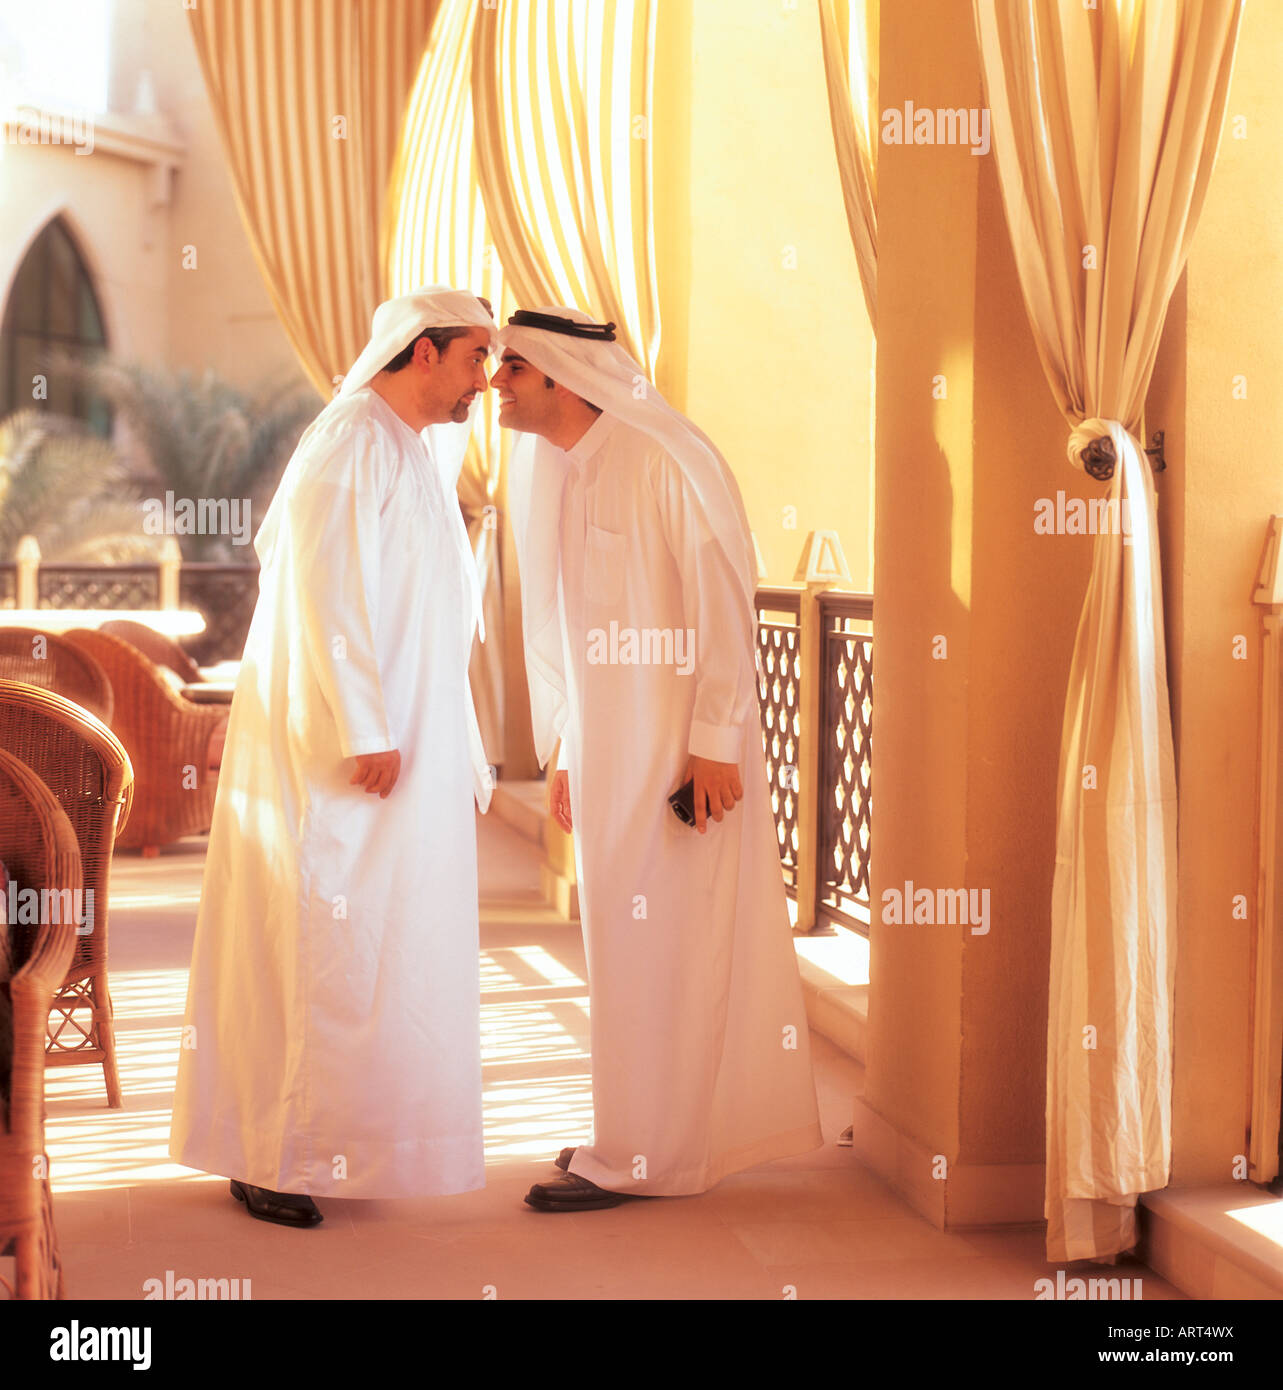 Arab men rubbing their noses traditional greeting stock photo arab men rubbing their noses traditional greeting kristyandbryce Choice Image